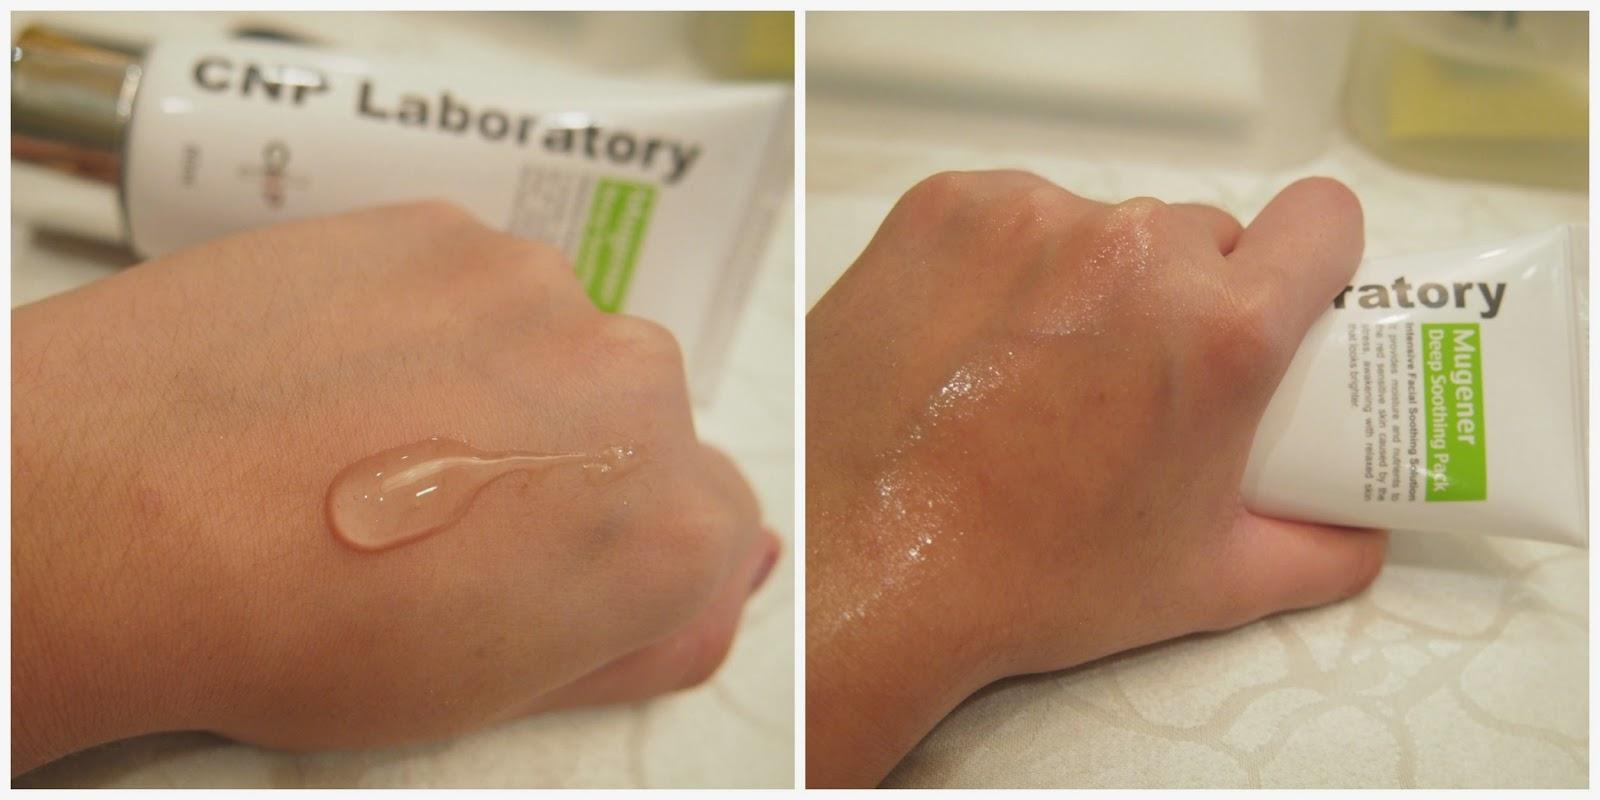 CNP Laboratory: Korean Dermatology Skincare at its best..